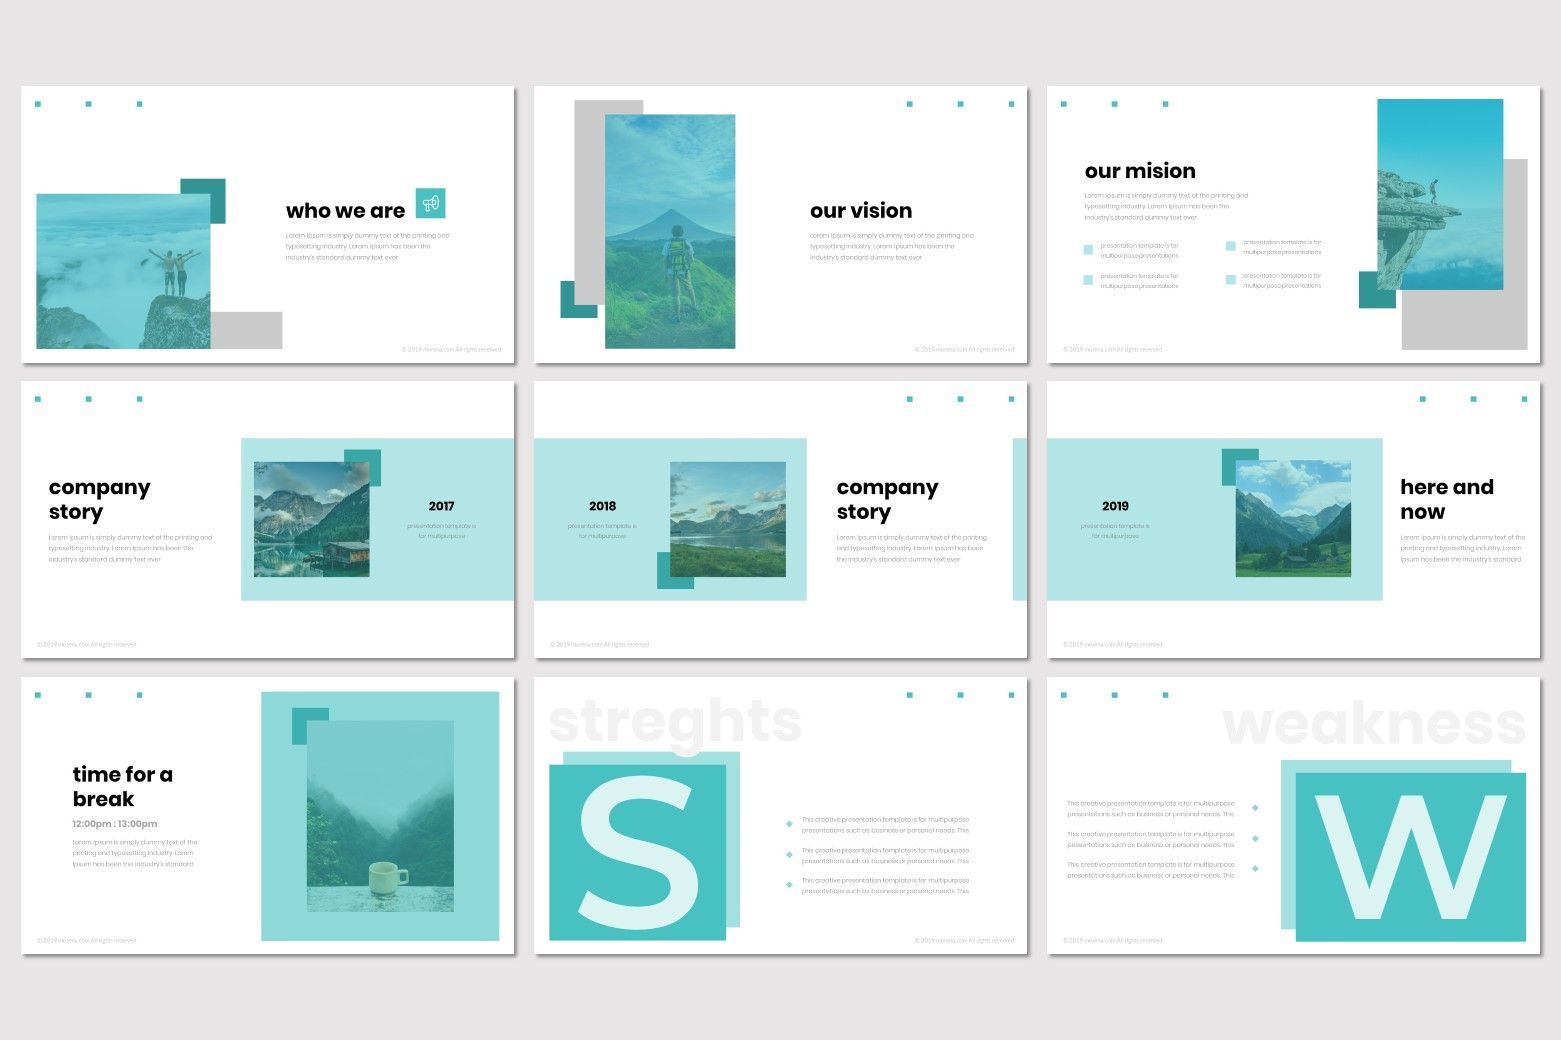 Moorena - PowerPoint Template, Slide 3, 07261, Presentation Templates — PoweredTemplate.com